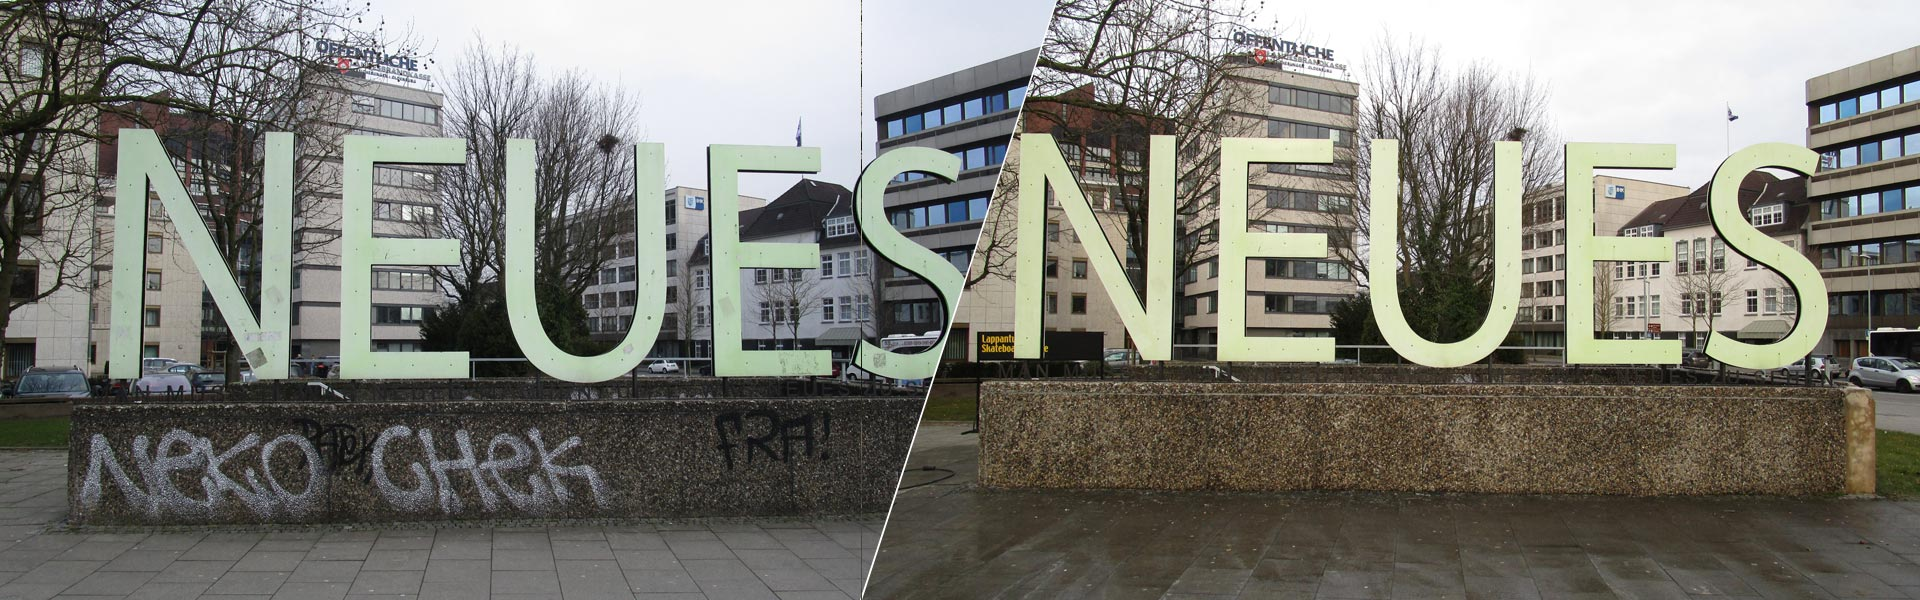 Graffitientfernung in Oldenburg Stadtmuseum